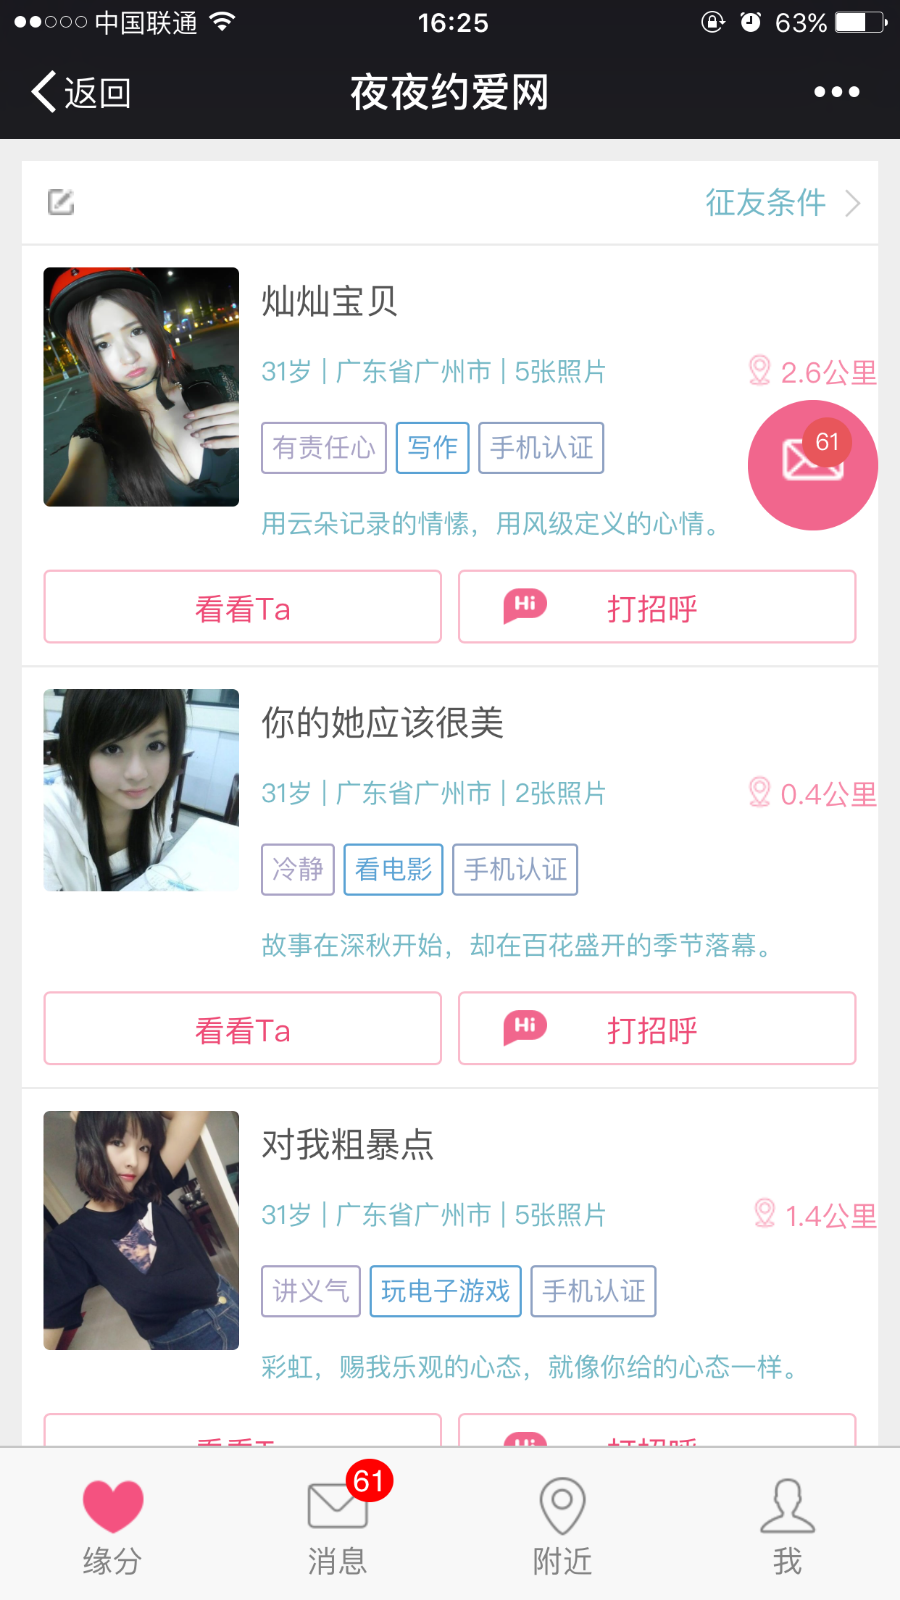 540�� 源�a��用 模�K�H售30元--粉�z啪啪啪